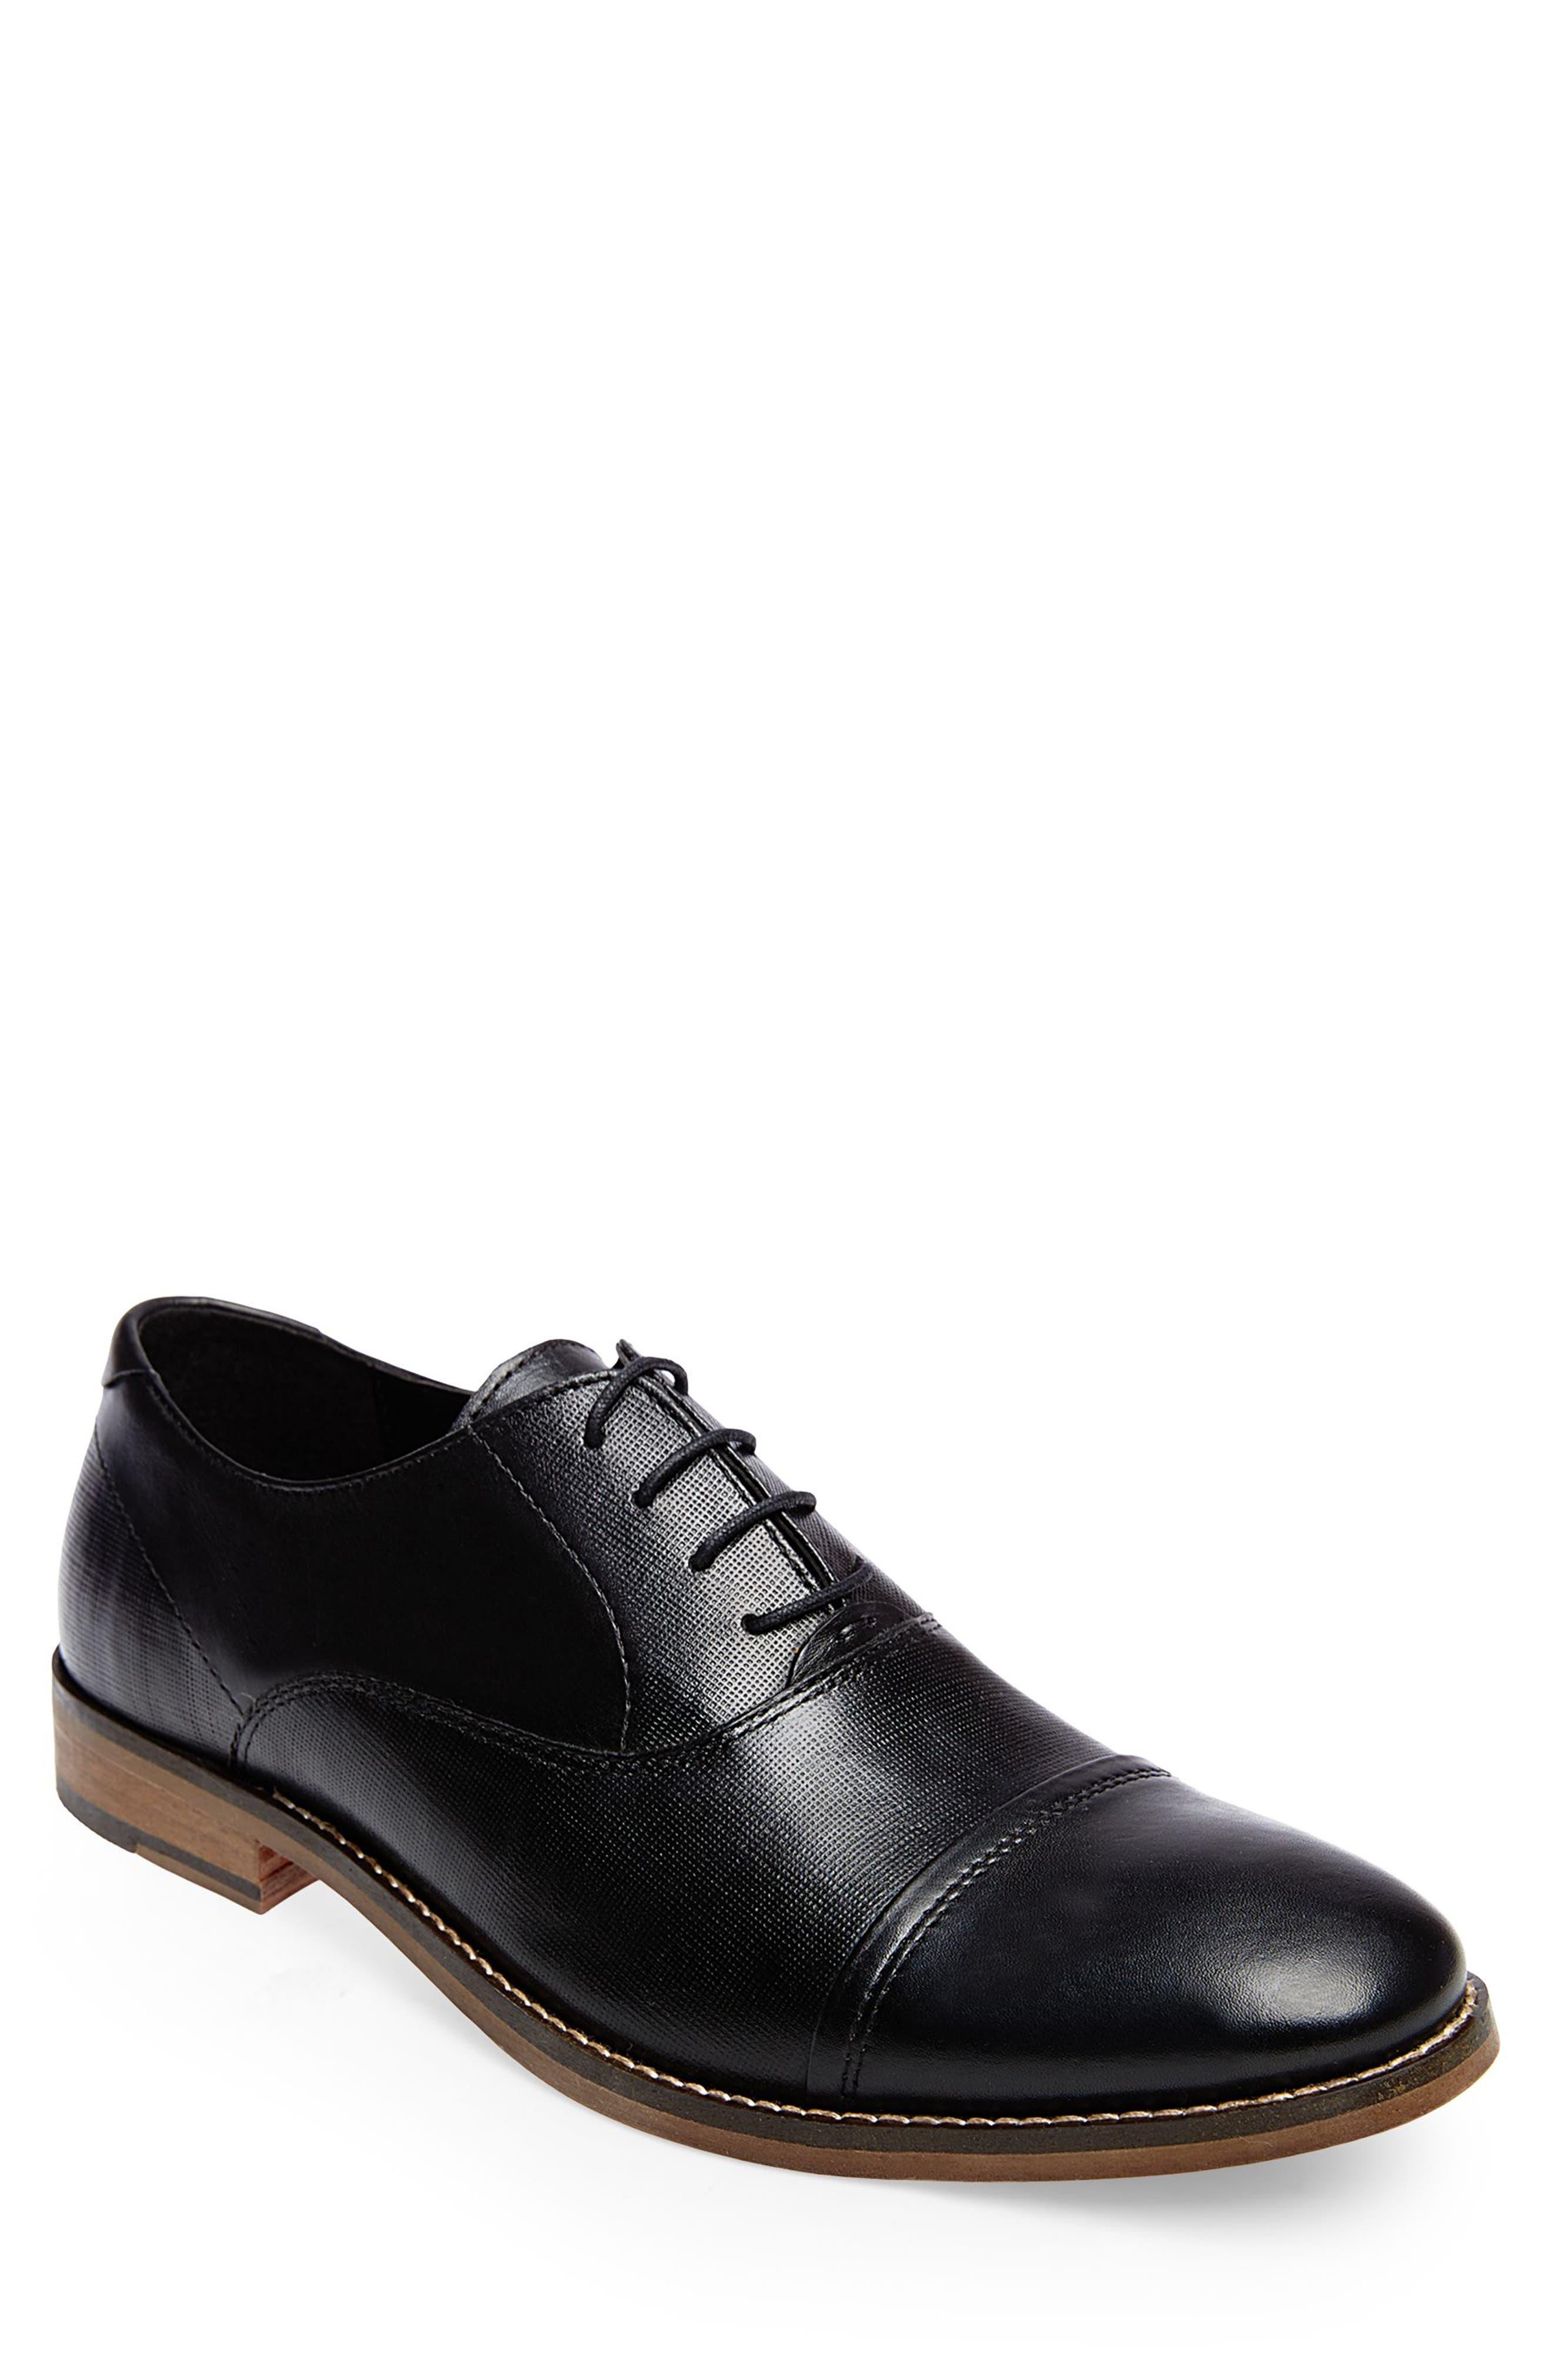 Finnich Textured Cap Toe Oxford,                         Main,                         color, BLACK